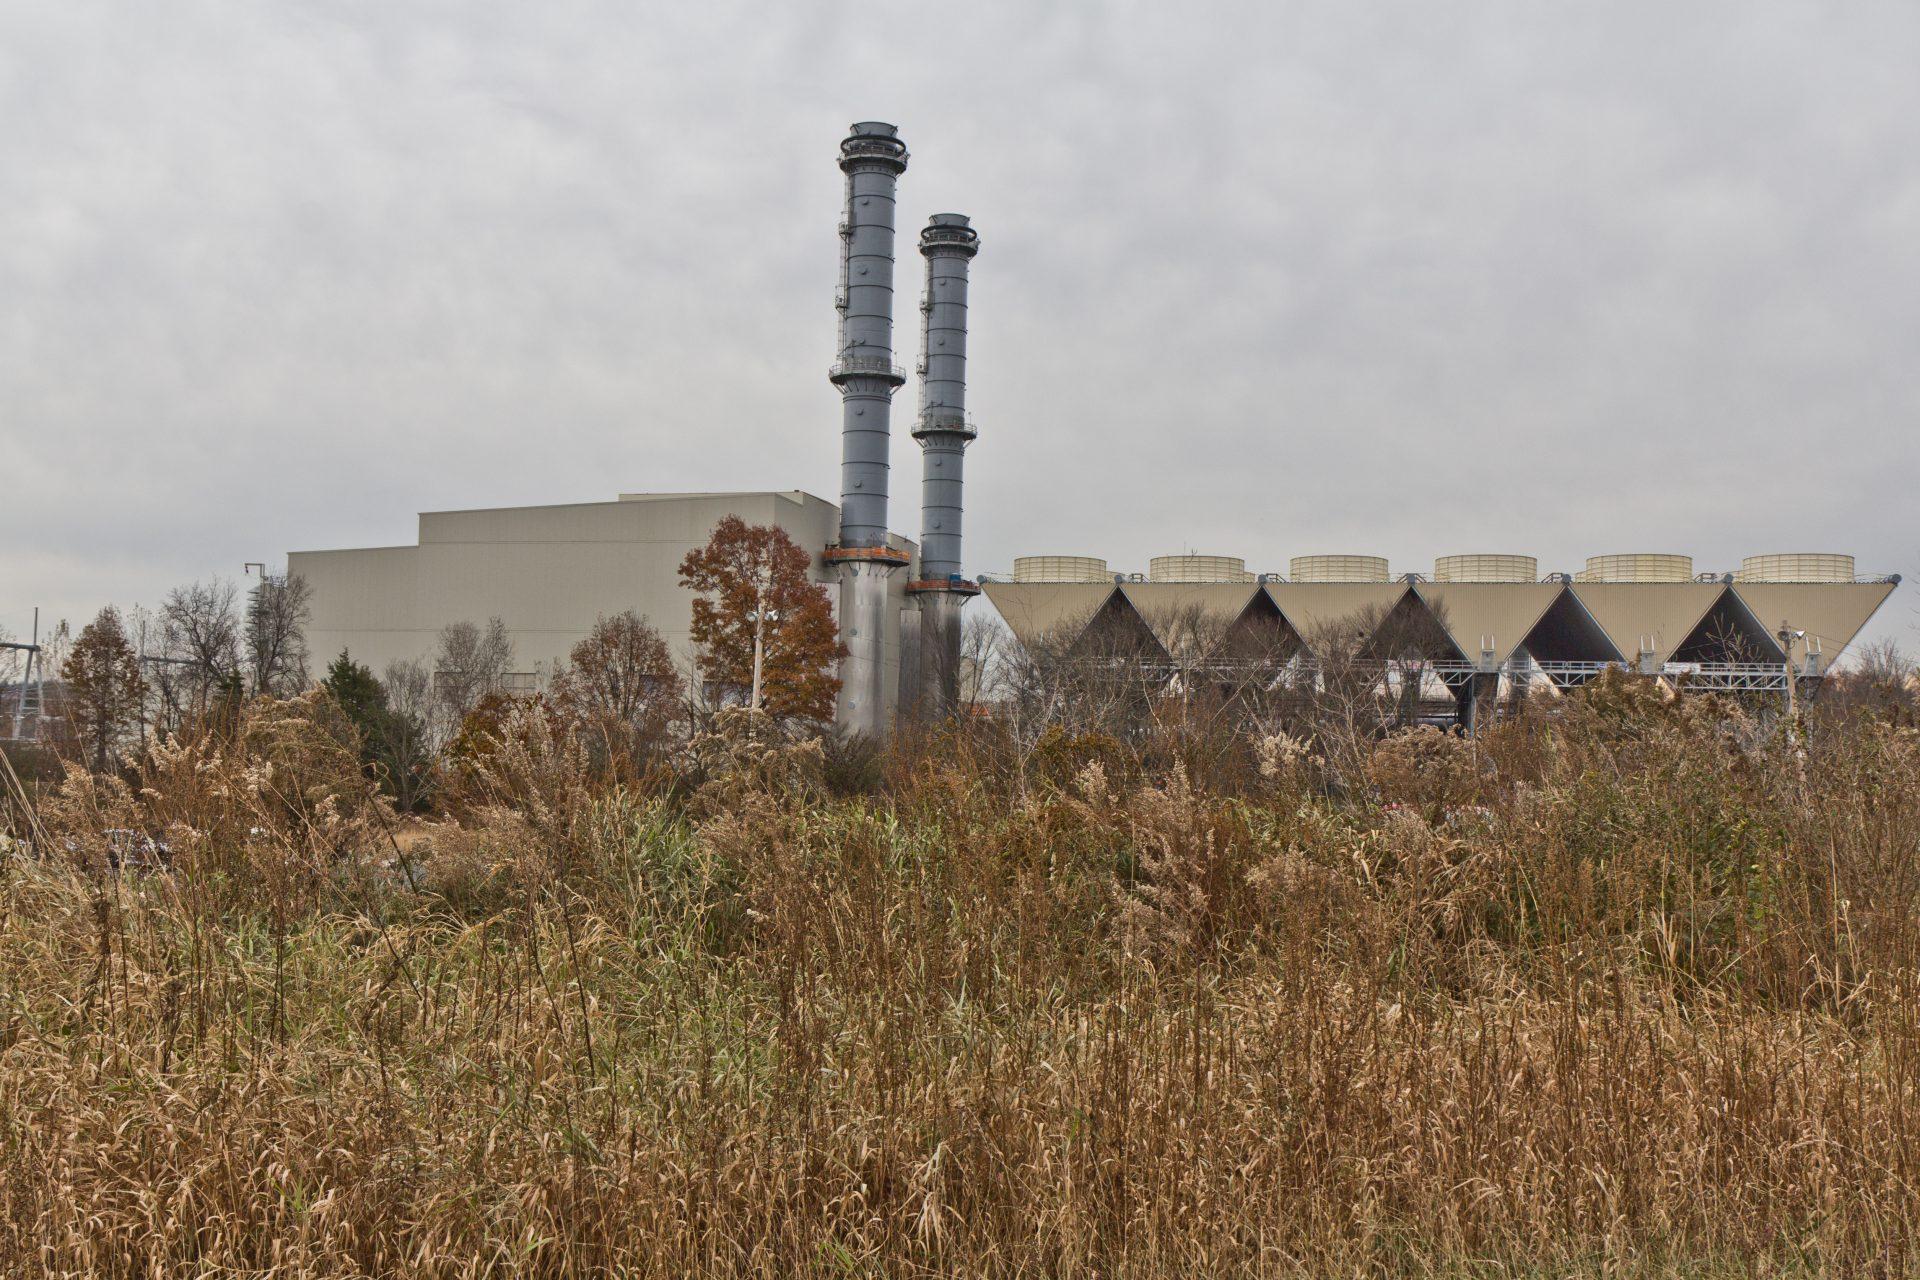 New York's heralded fracking ban isn't all it's cracked up